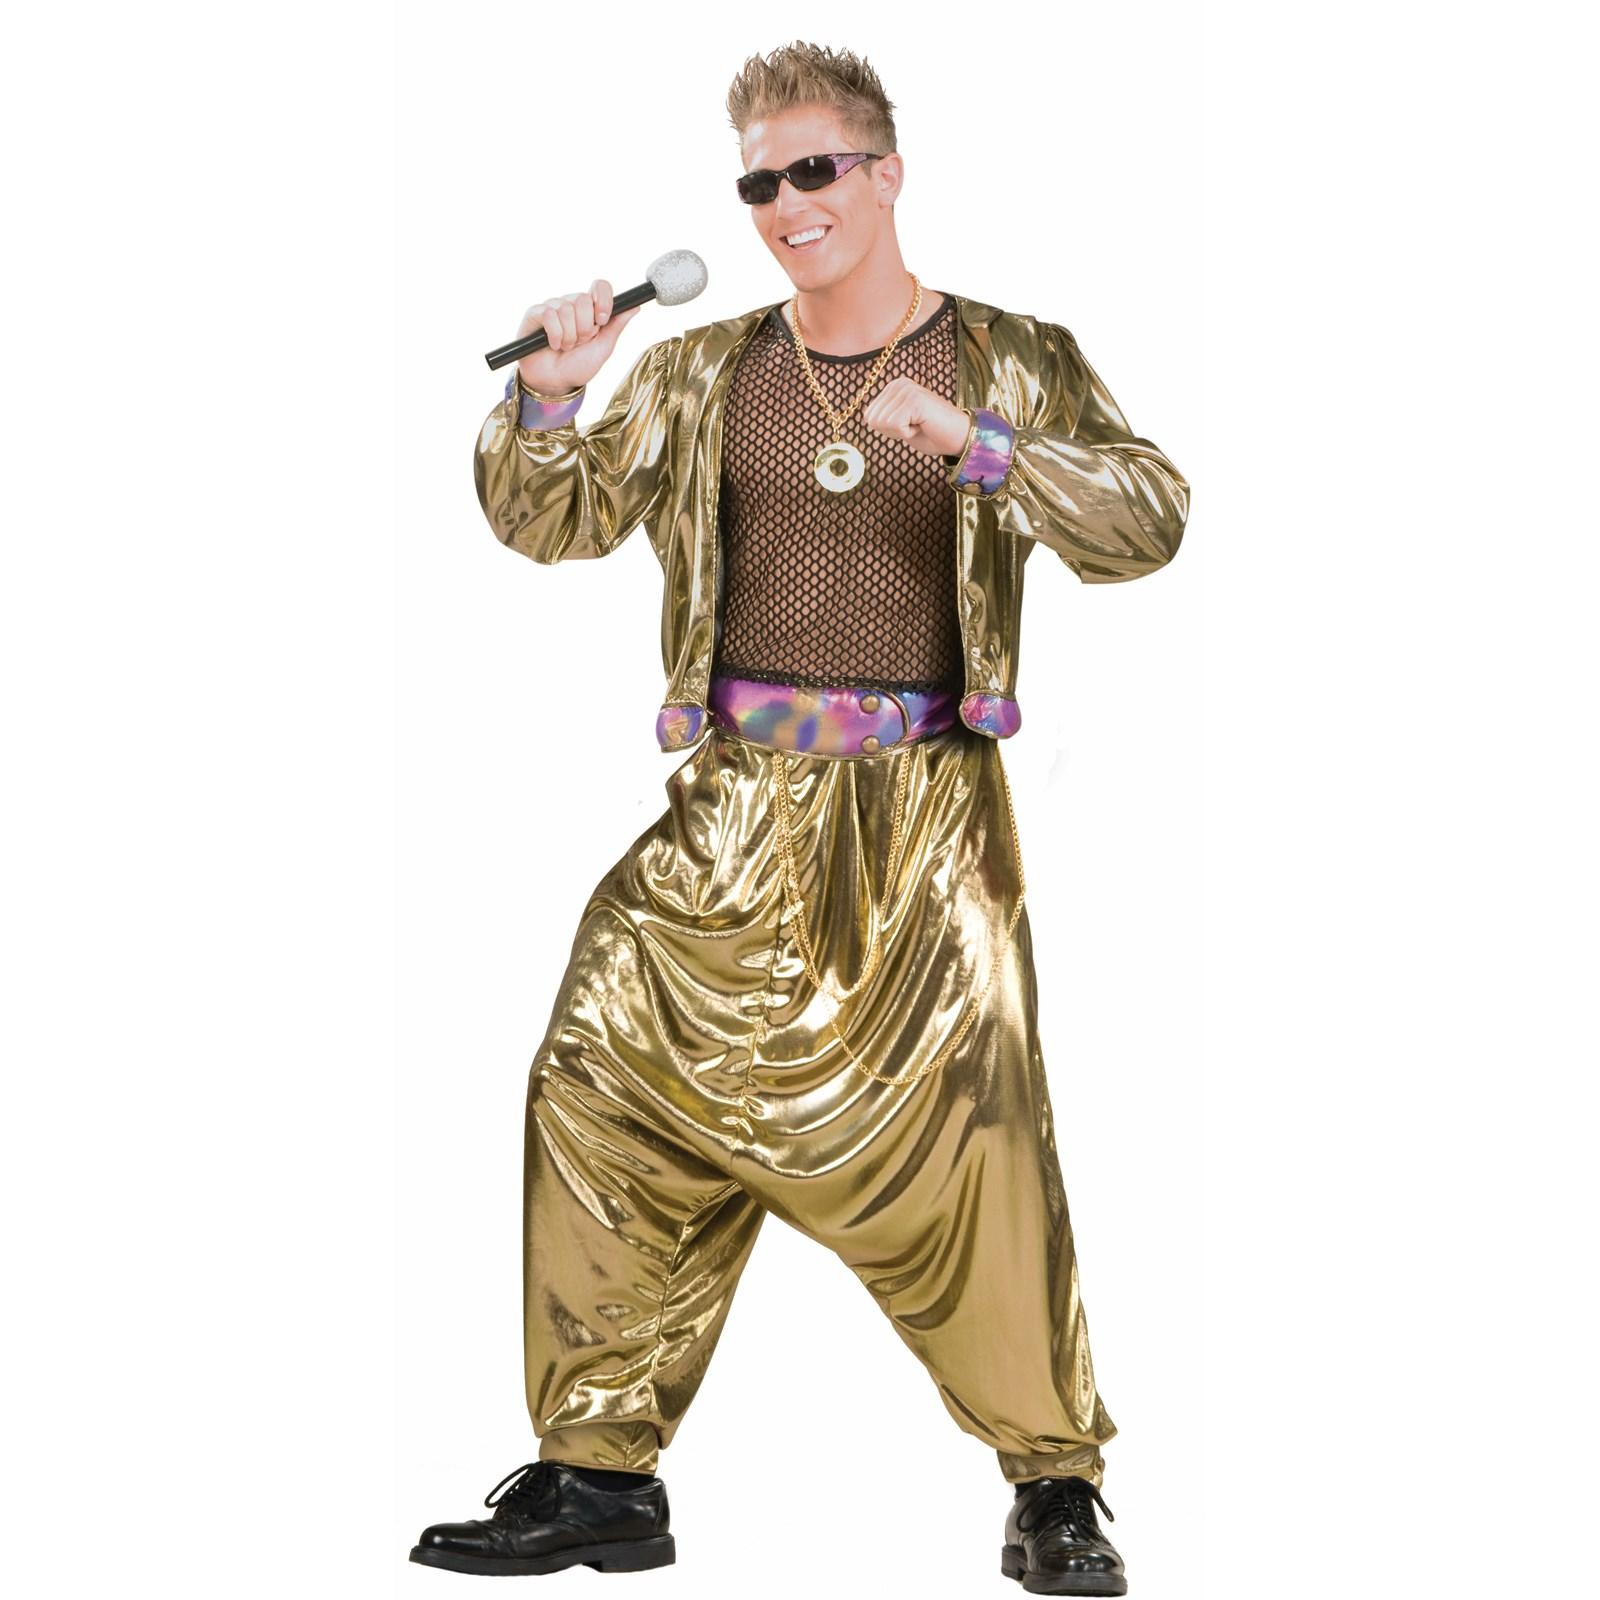 80s Video Super Star Adult Costume   BuyCostumes.com